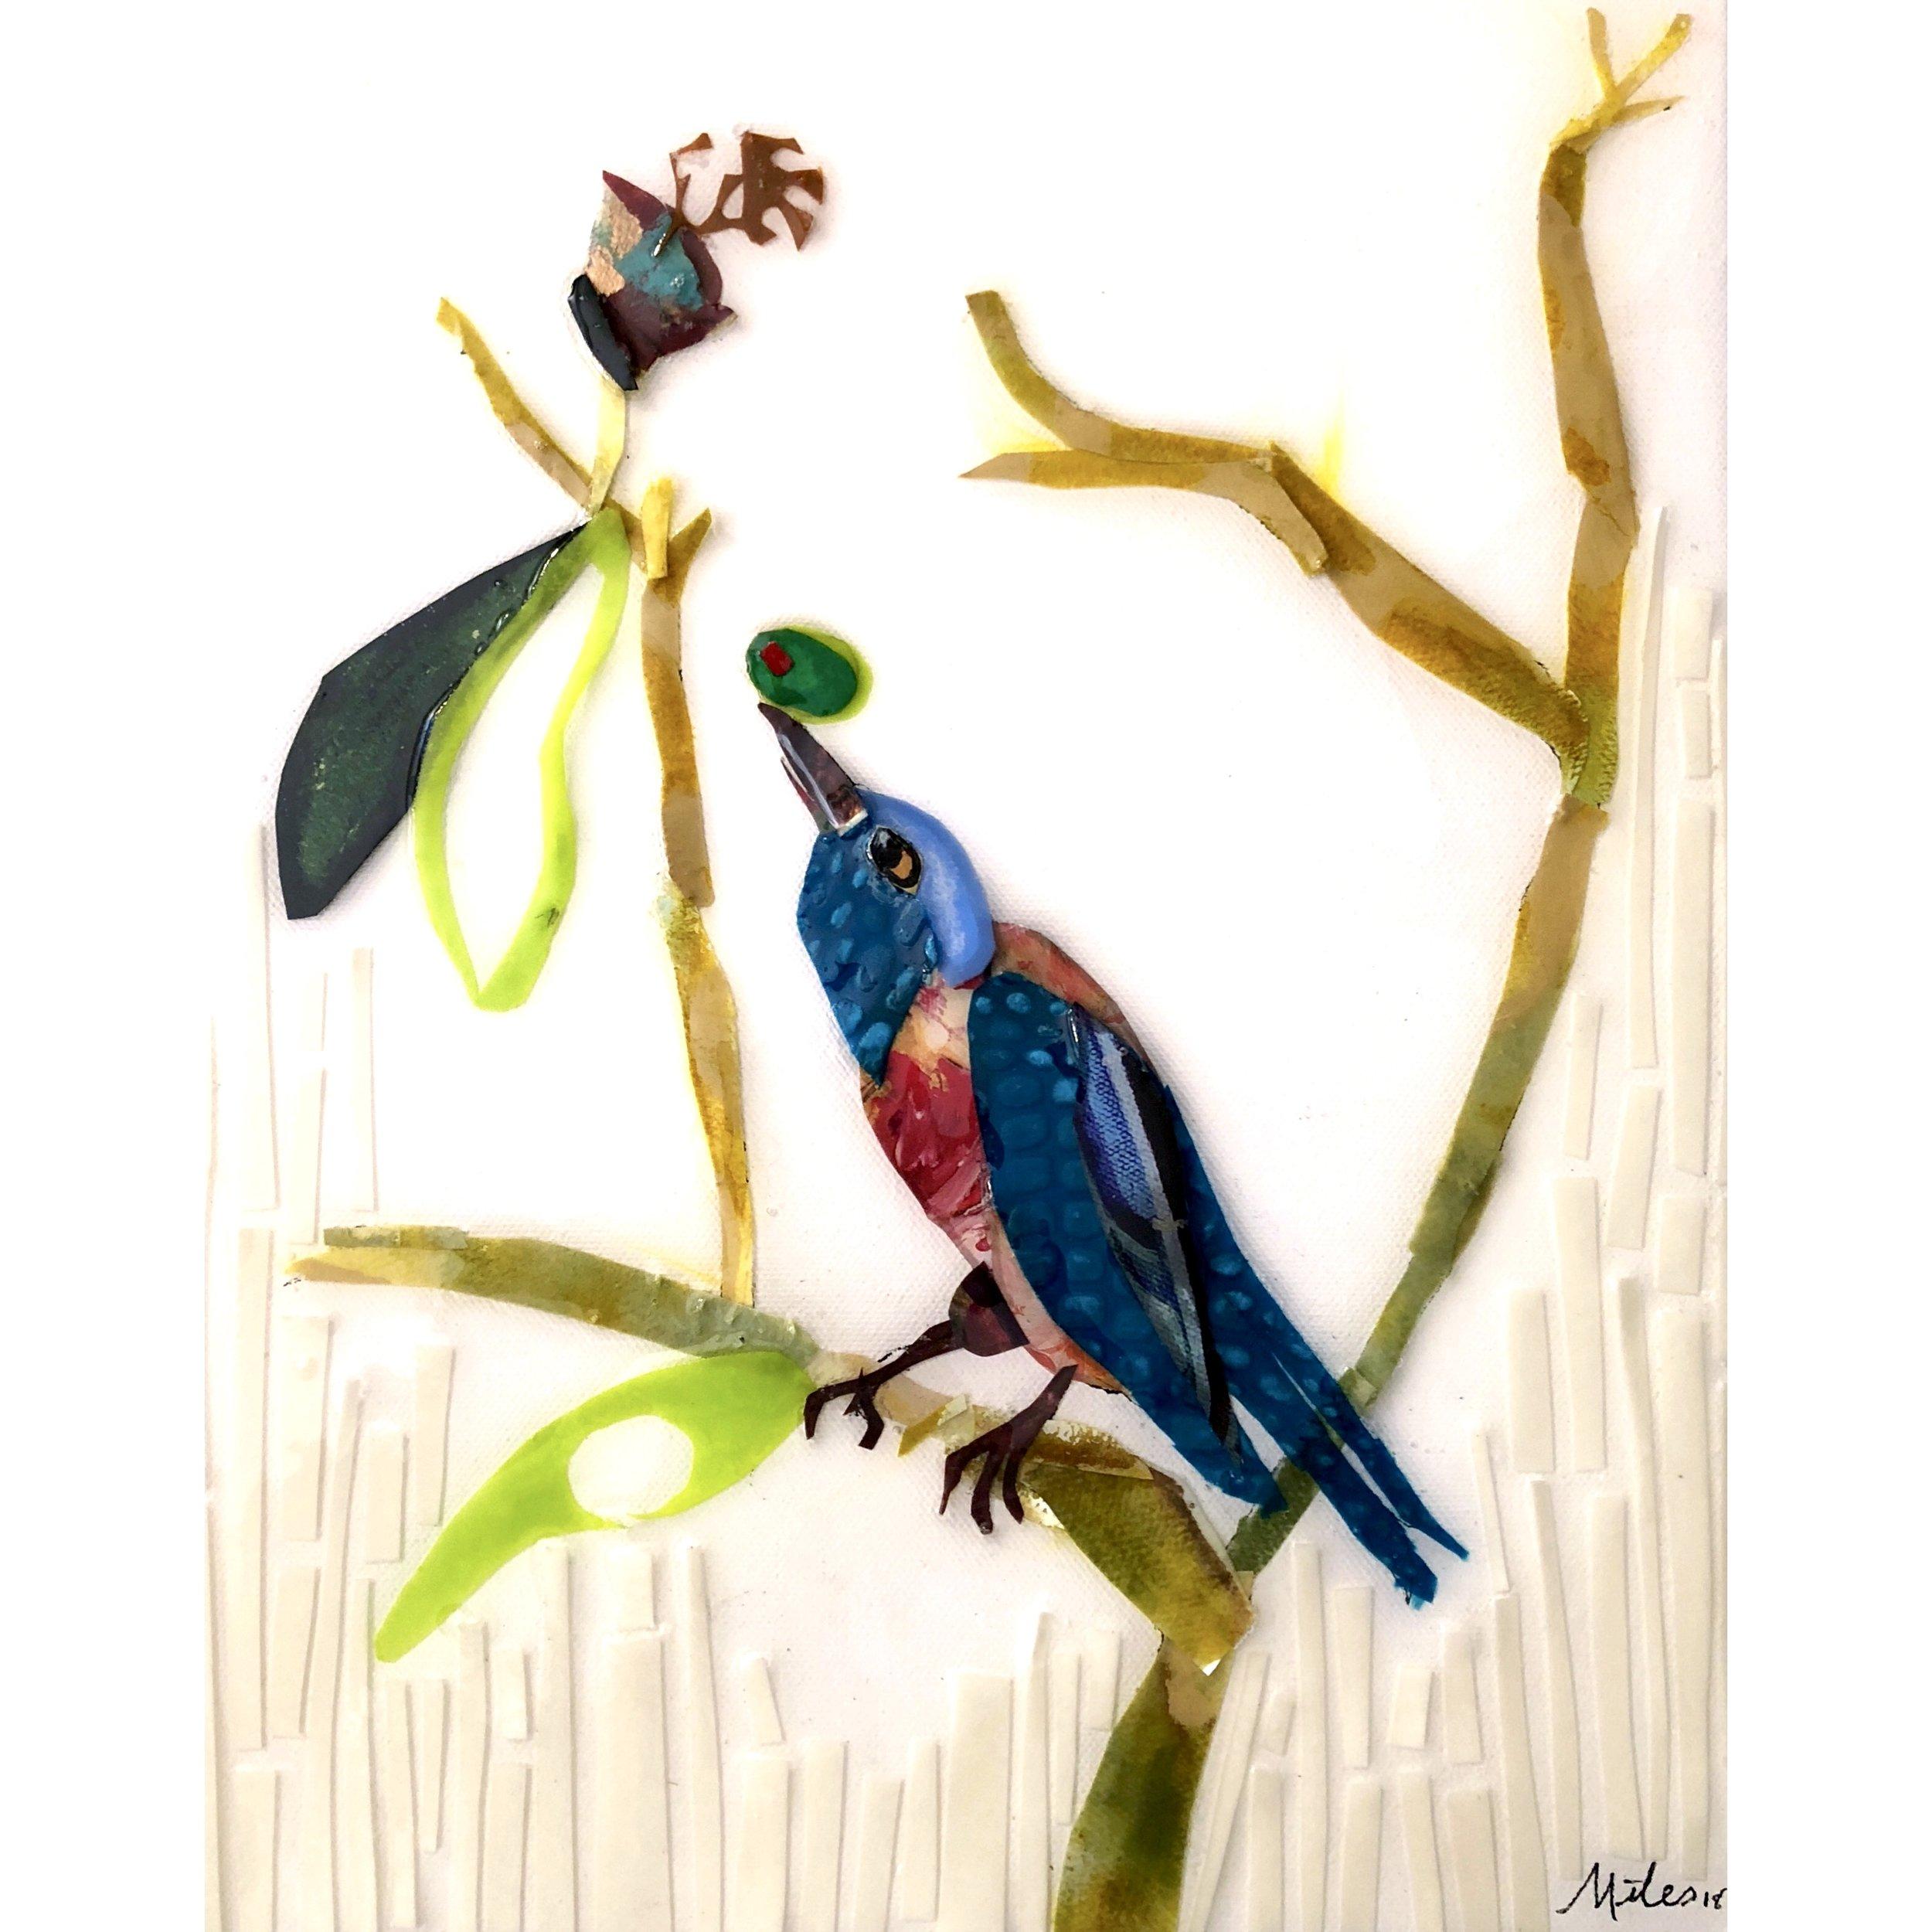 Martini Birds of America: The Western Blue Bird - 11